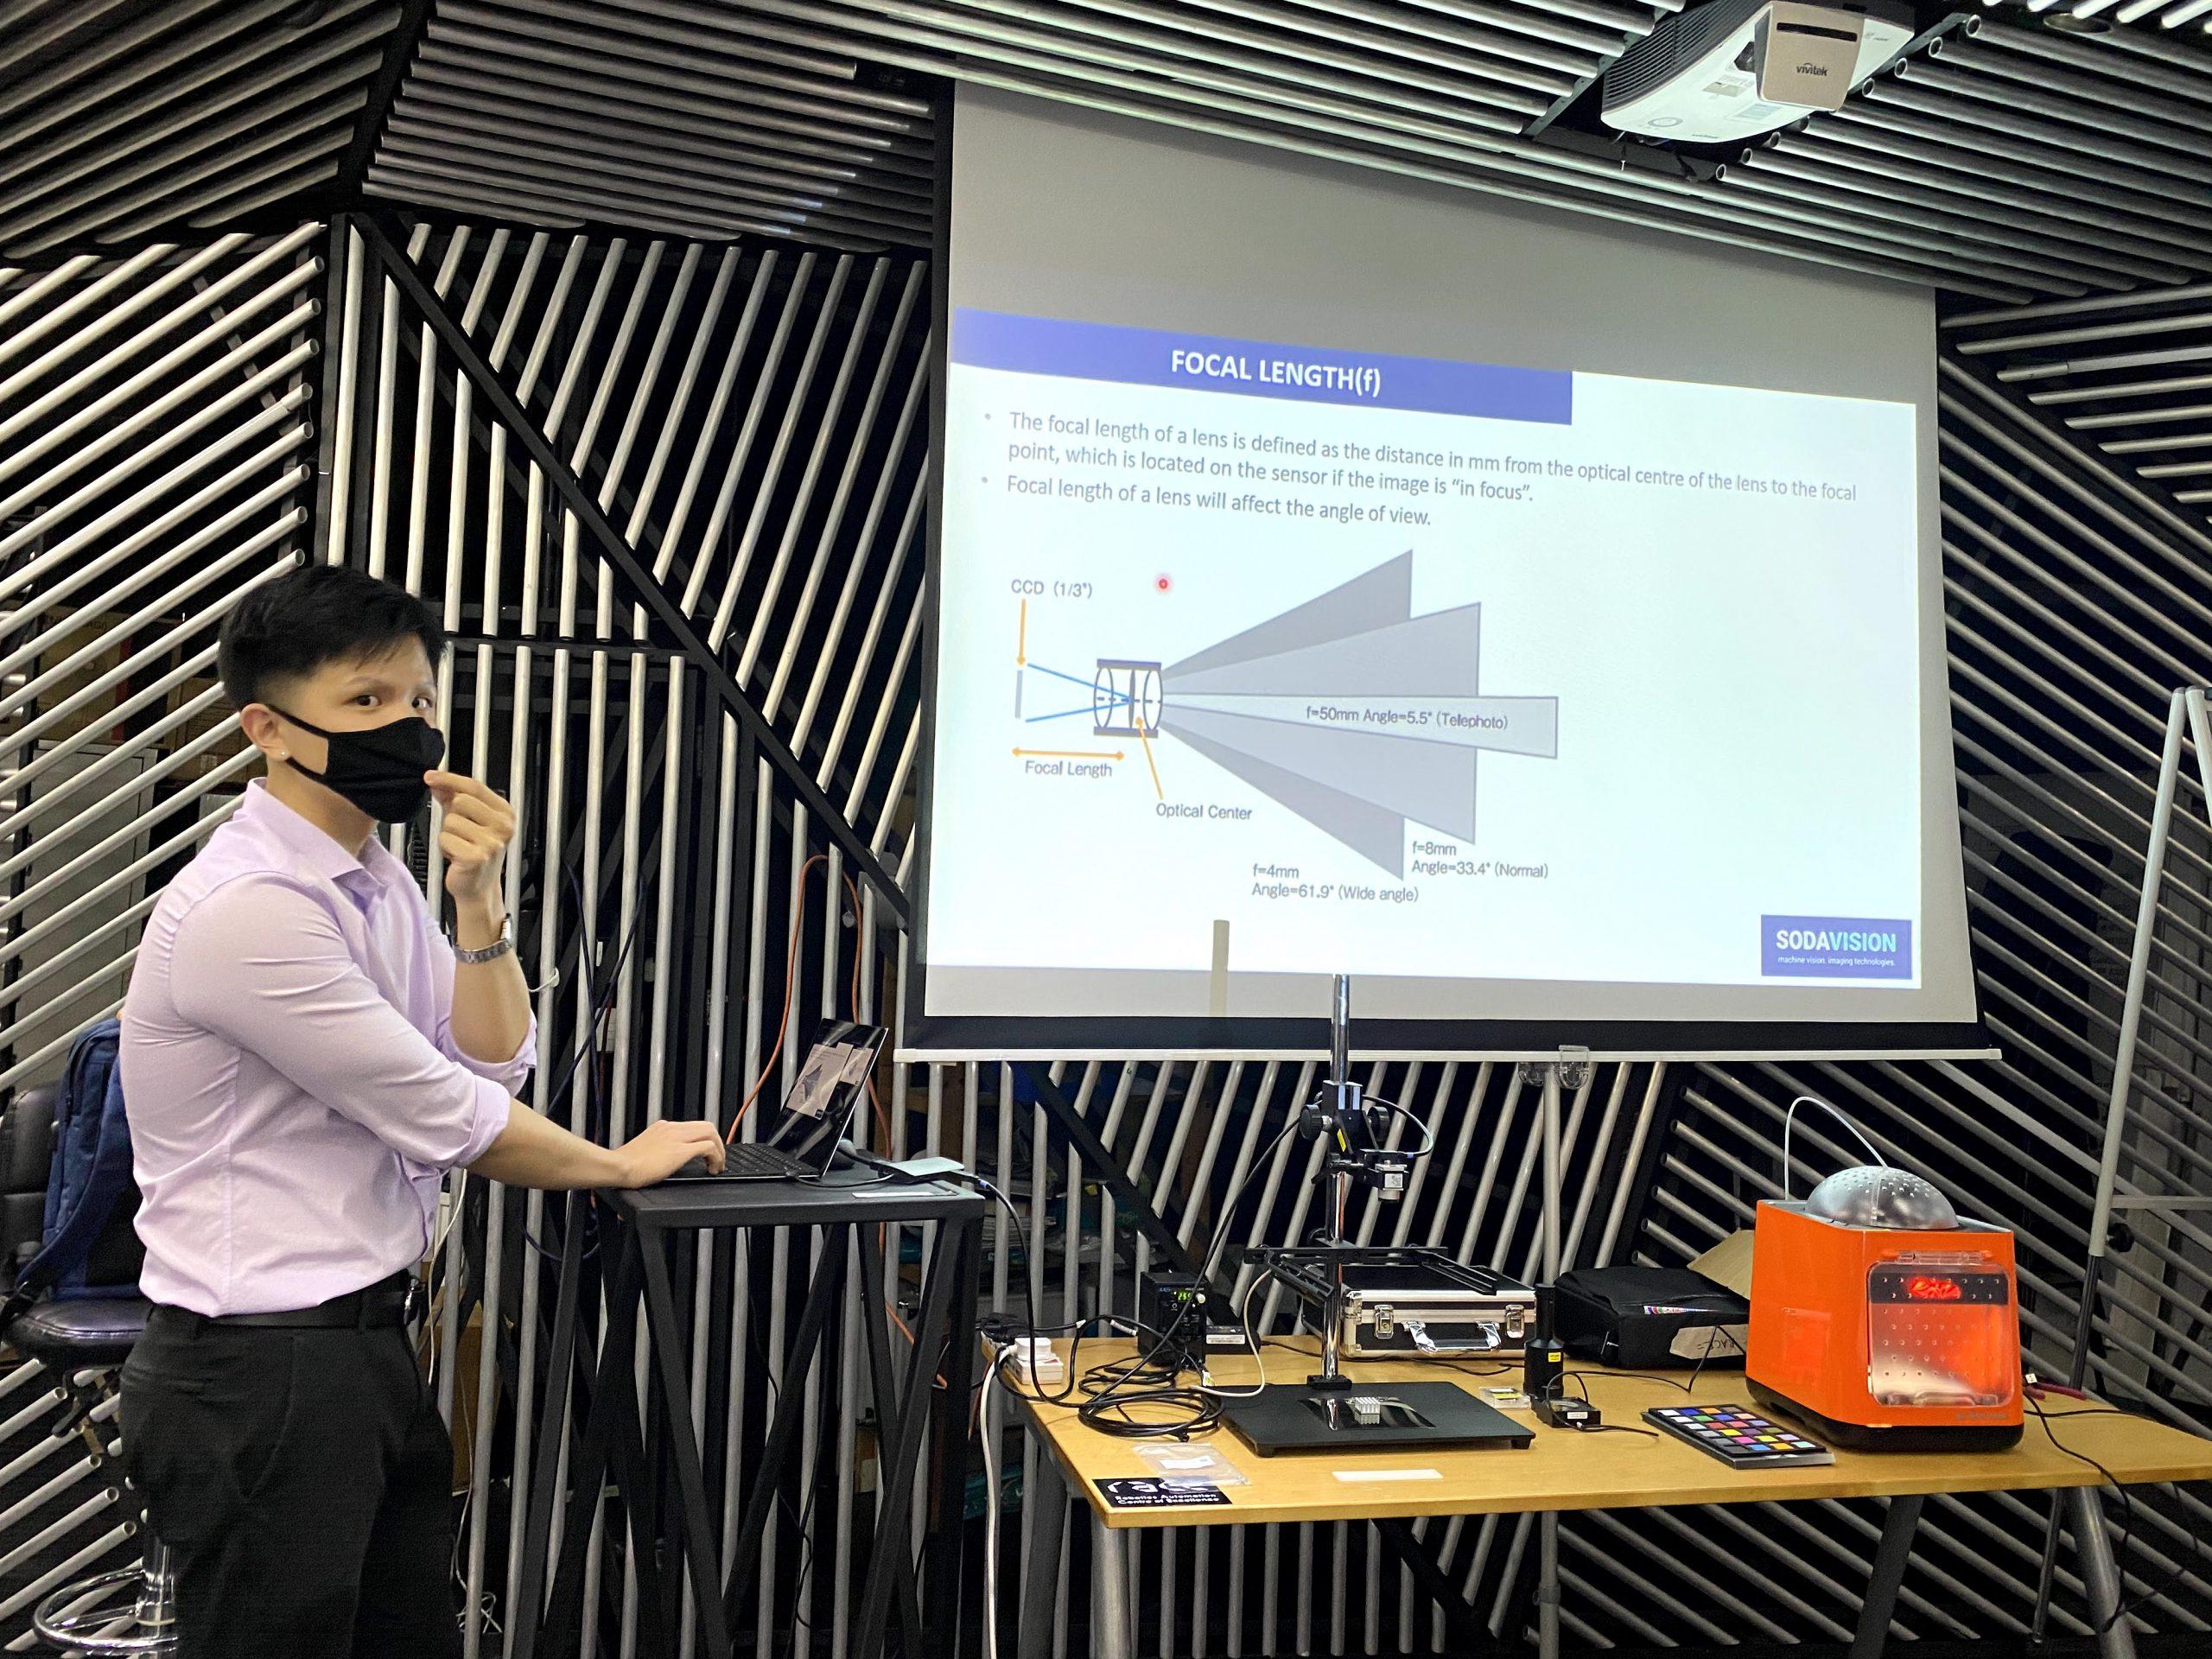 sodavision-machinevision-professional-educationprogram